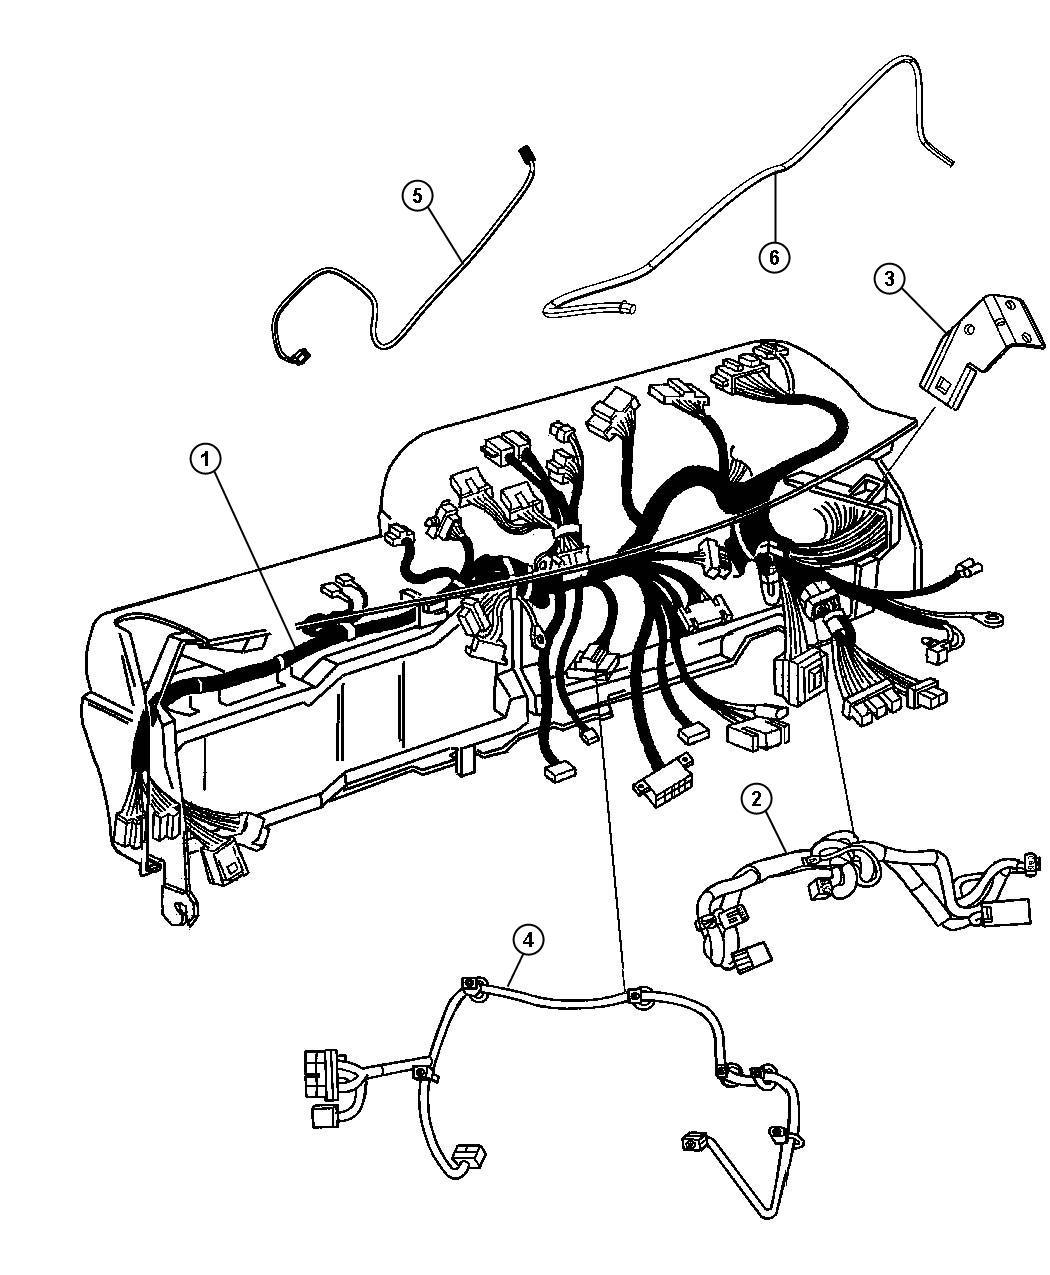 Dodge Ram 2500 Wiring. Instrument panel. Module, xrb, xac